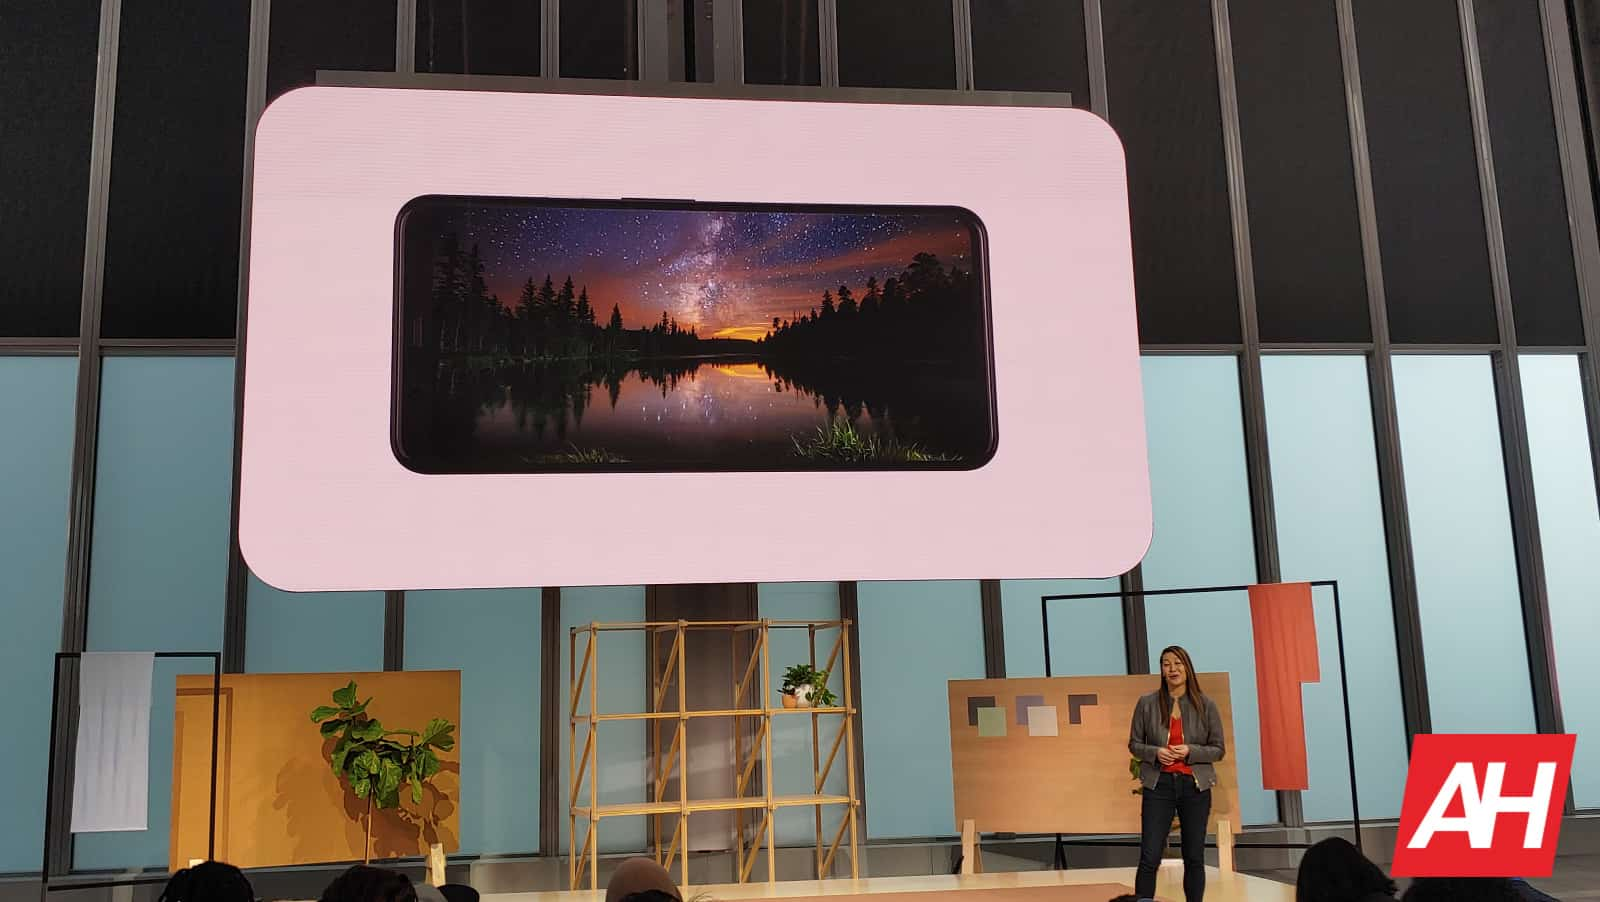 Pixel 4 camera features